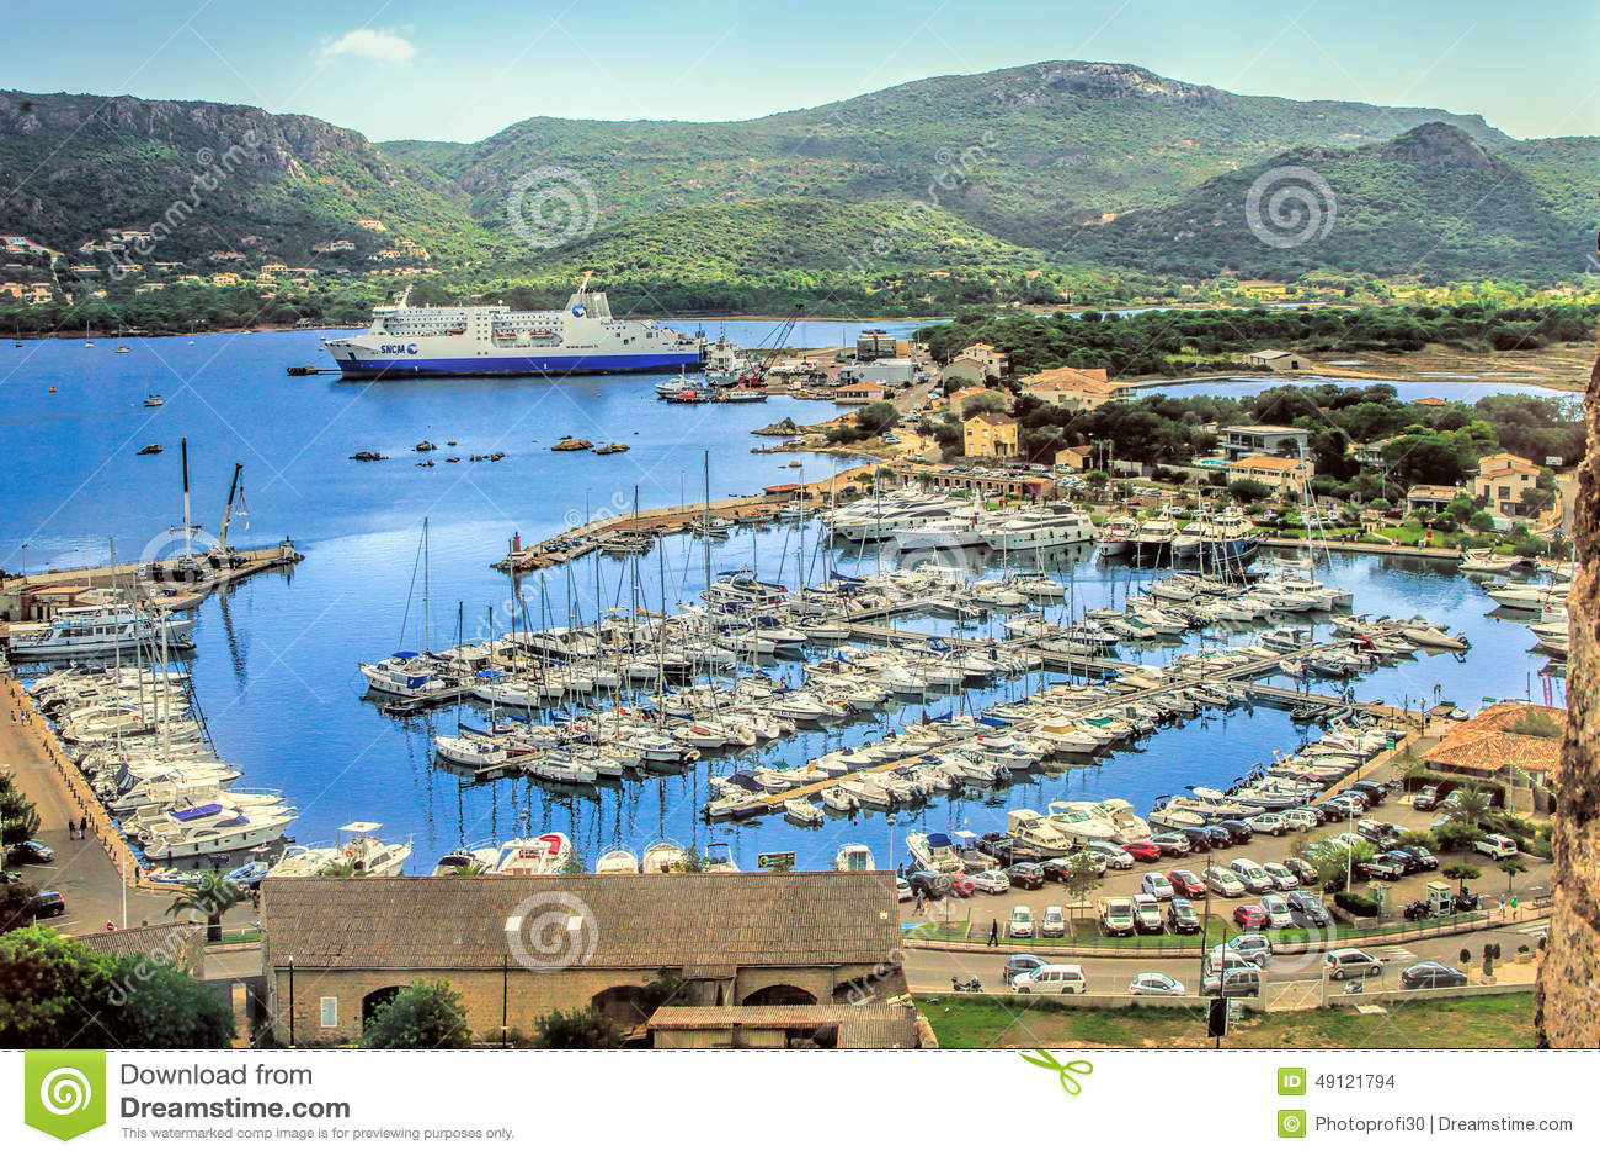 porto vecchio corsica france editorial stock image image of citadel beach 49121794. Black Bedroom Furniture Sets. Home Design Ideas